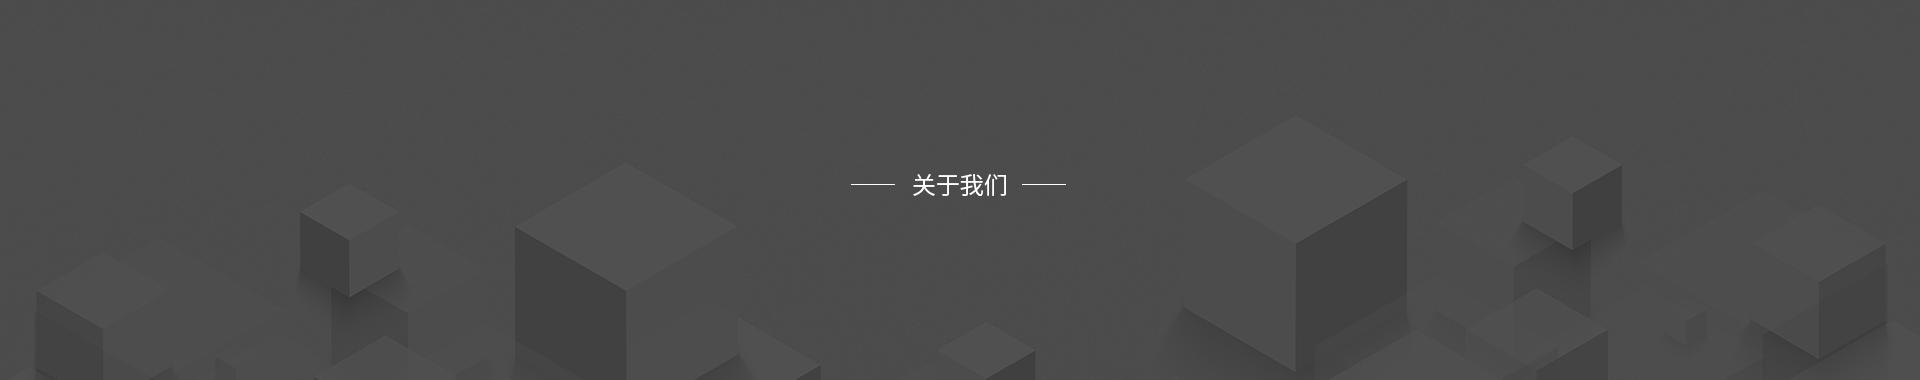 https://www.haishizaixian.com/data/upload/202007/20200718101122_981.jpg